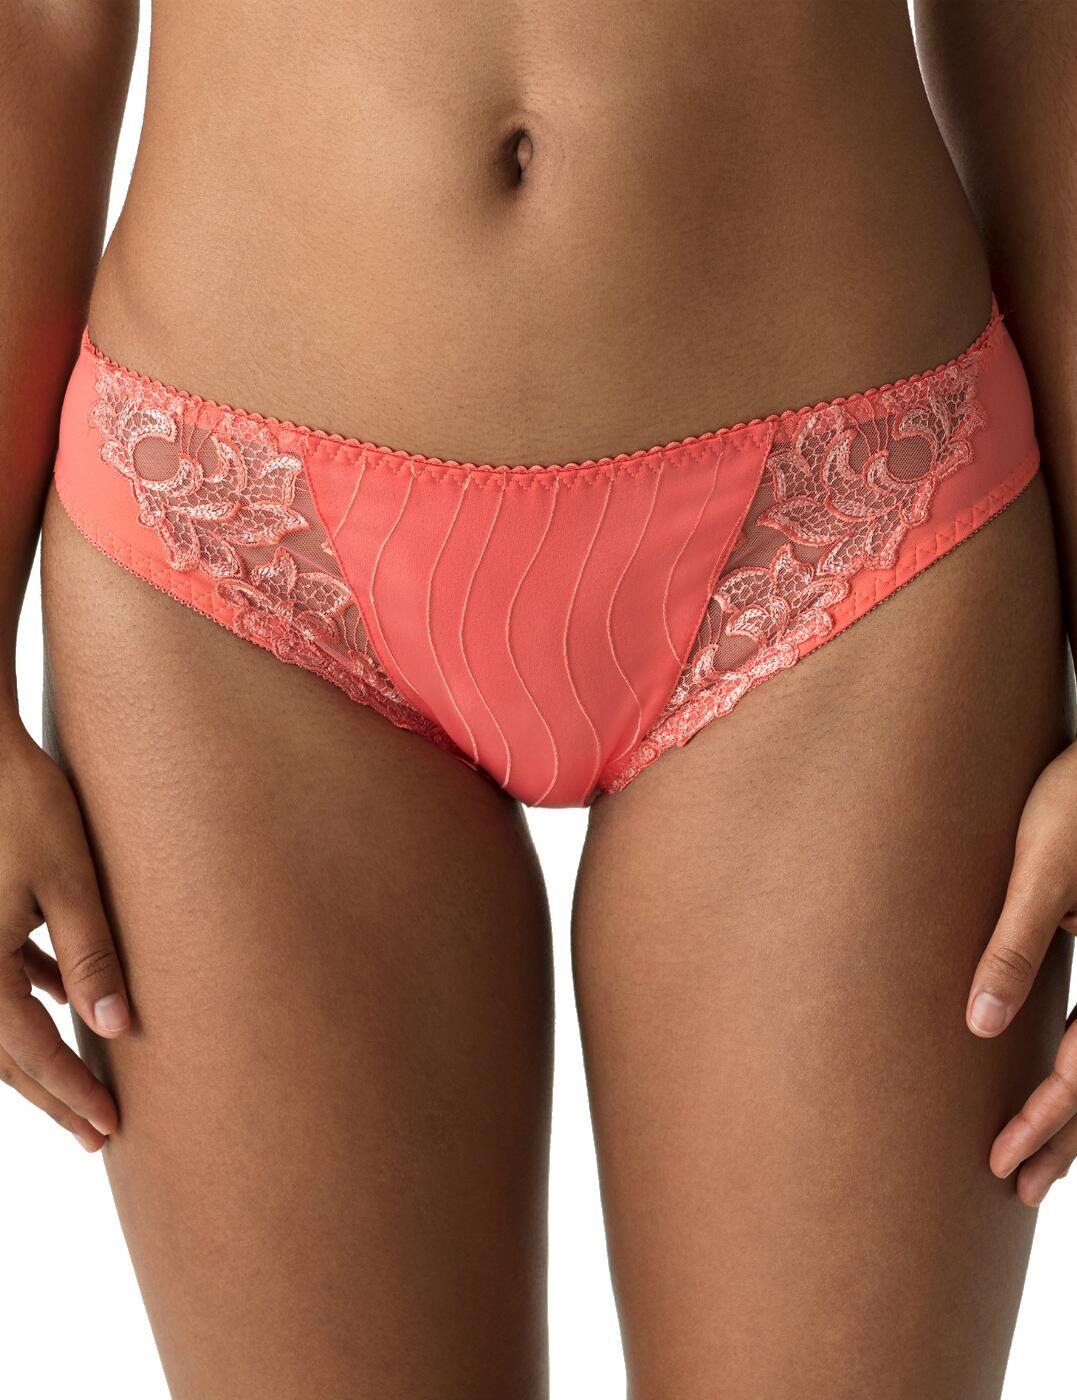 Prima-Donna-Deauville-Rio-Slips-Culotte-0561810-Neuf-Luxe-Femme-Lingerie miniature 21